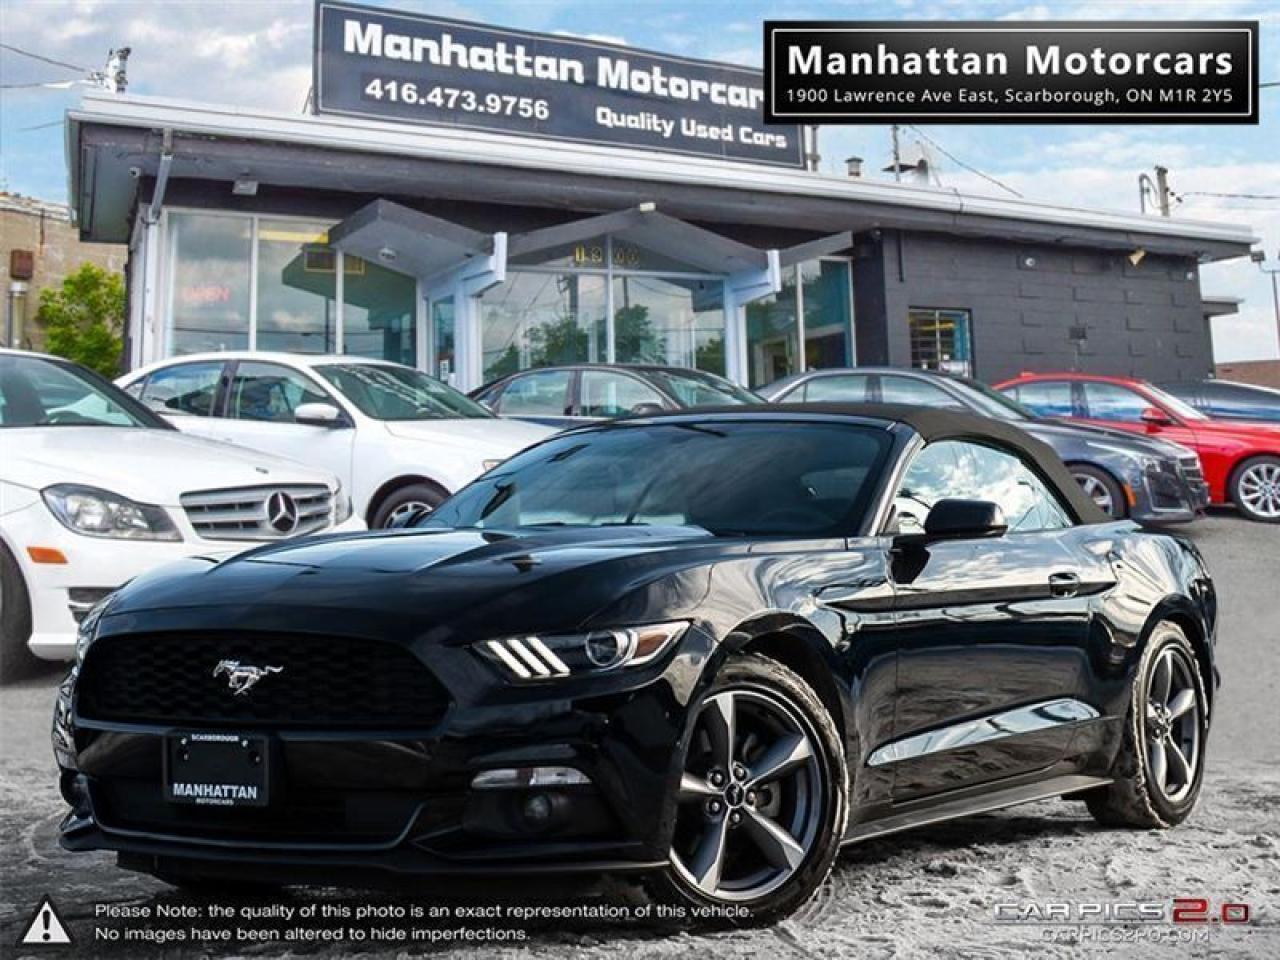 2017 Ford Mustang V6 CONVERTIBLE  CAMERA REMOTE START WARRANTY